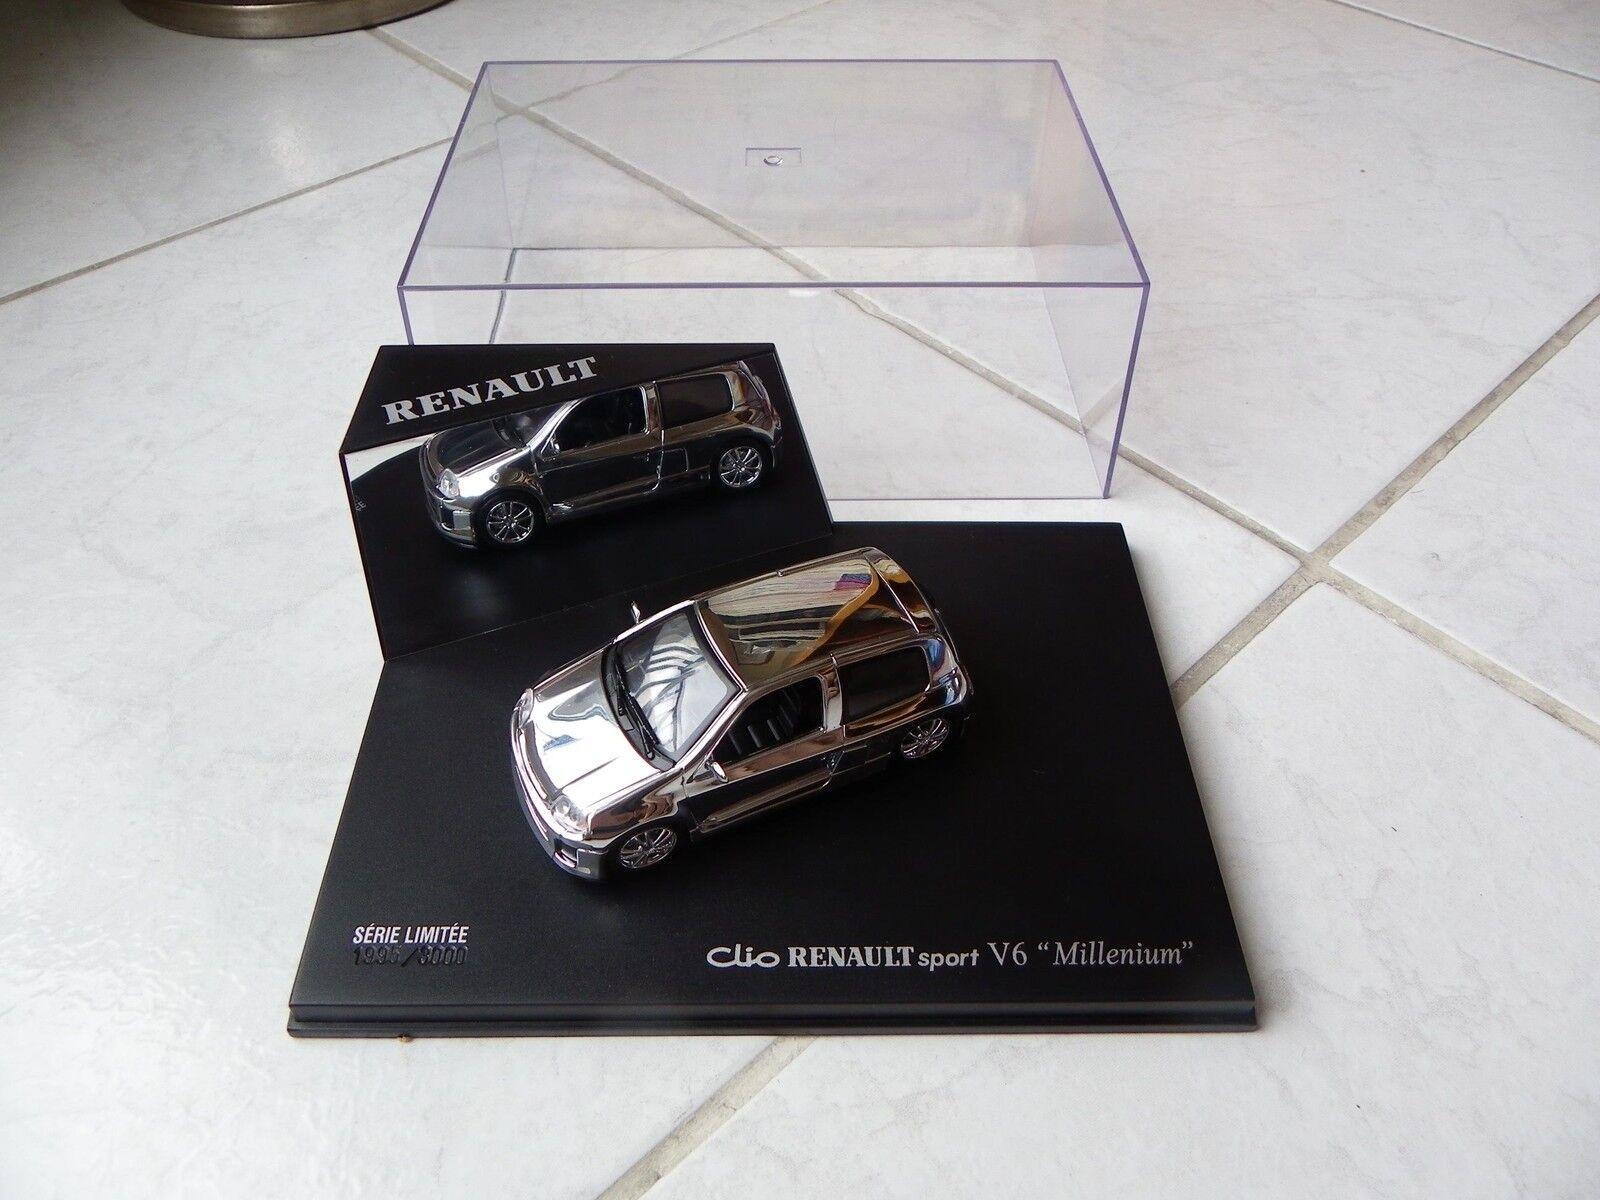 Renault Sport Clio V6 Millenium Universal Hobbies 1995 3000 1 43 miniature